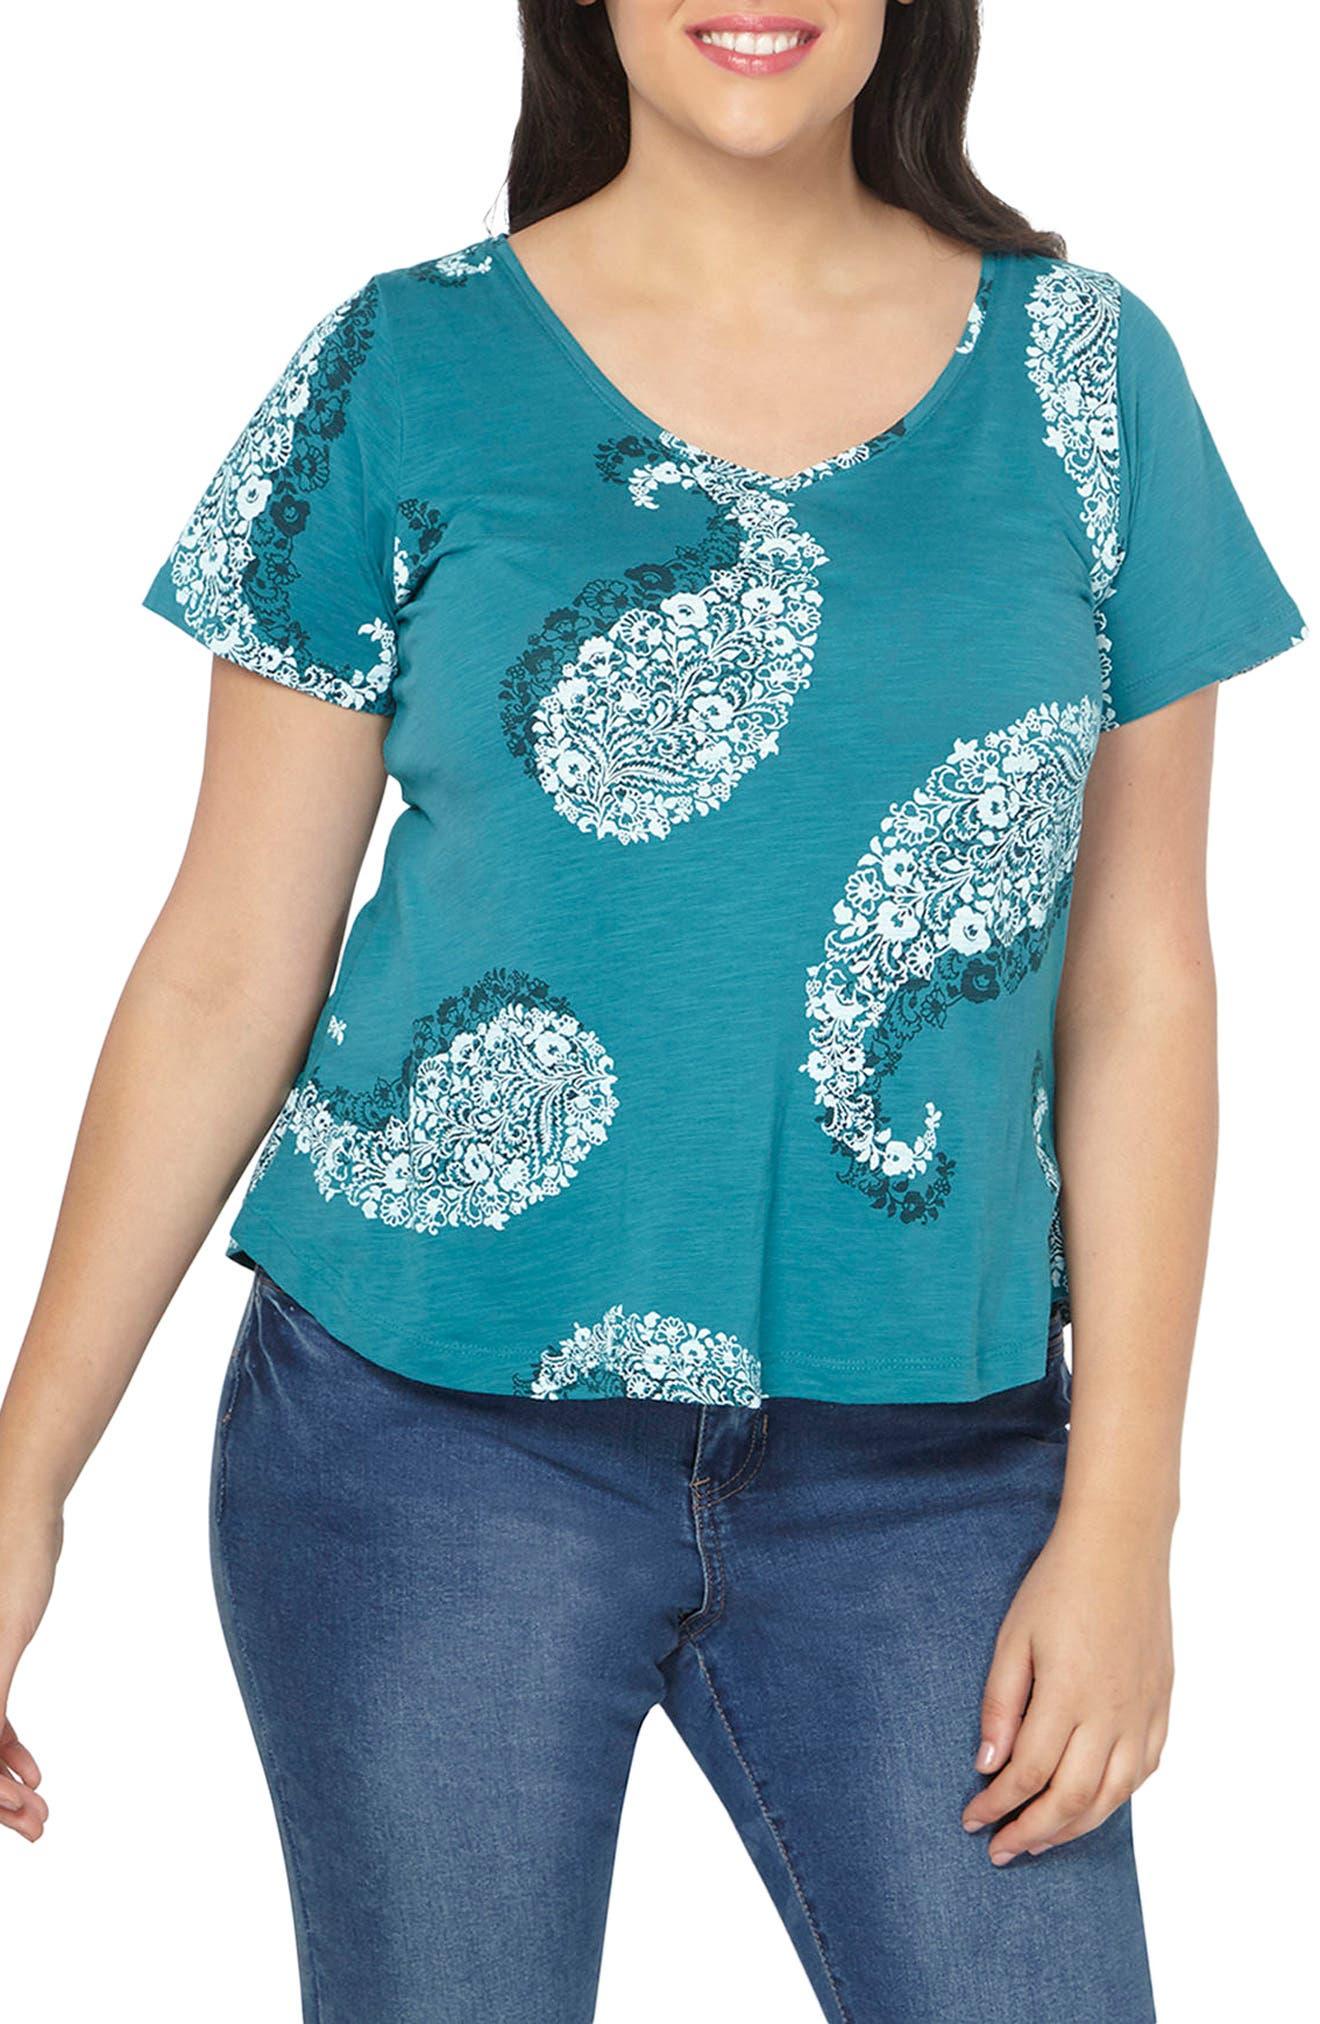 Evan Paisley Short Sleeve Shirt,                         Main,                         color, 401